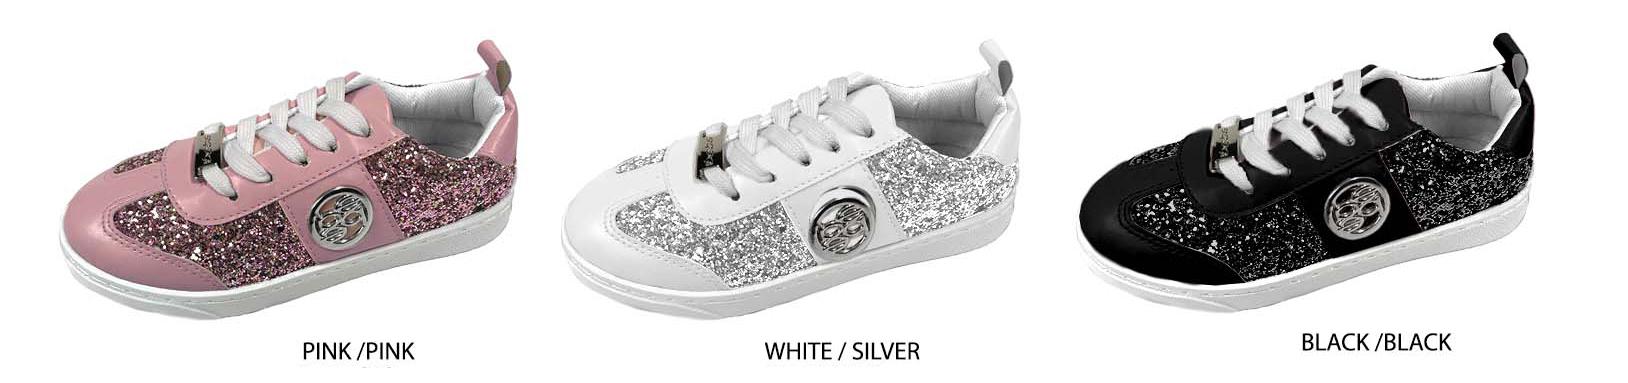 Girl's Low-Top SNEAKERS w/ Glitter Embellishment